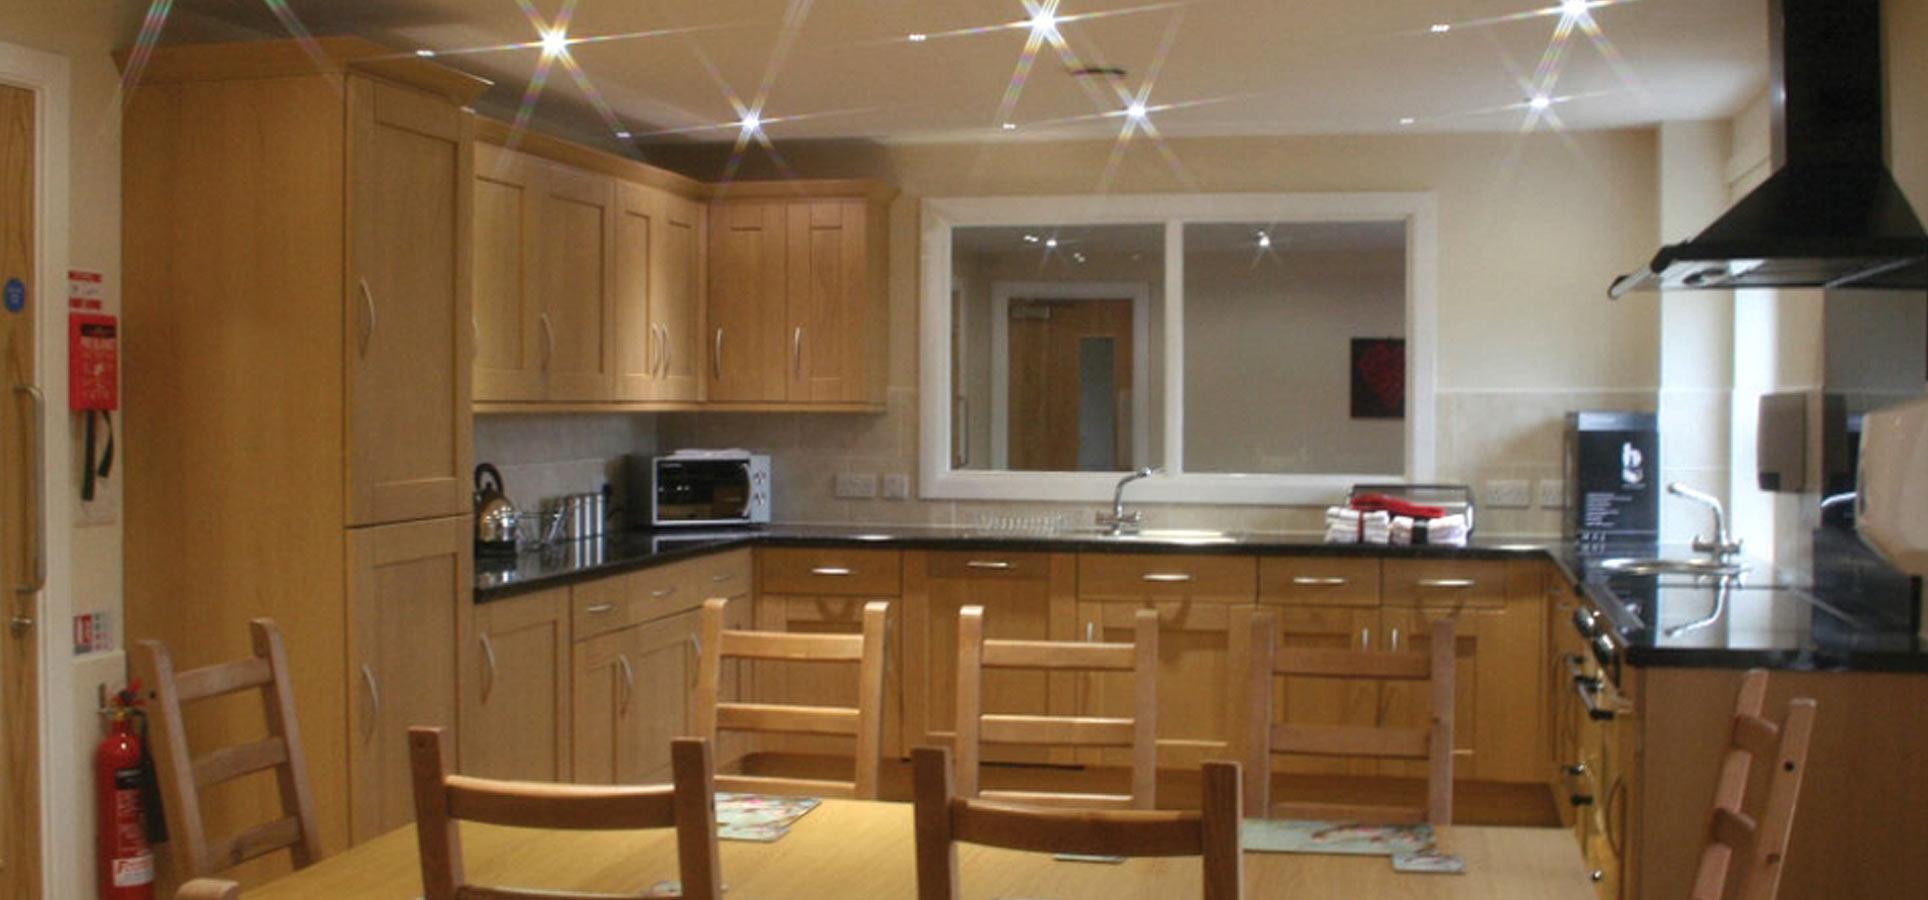 Kirklington Hall, Accommodation, Jessops Construction Ltd